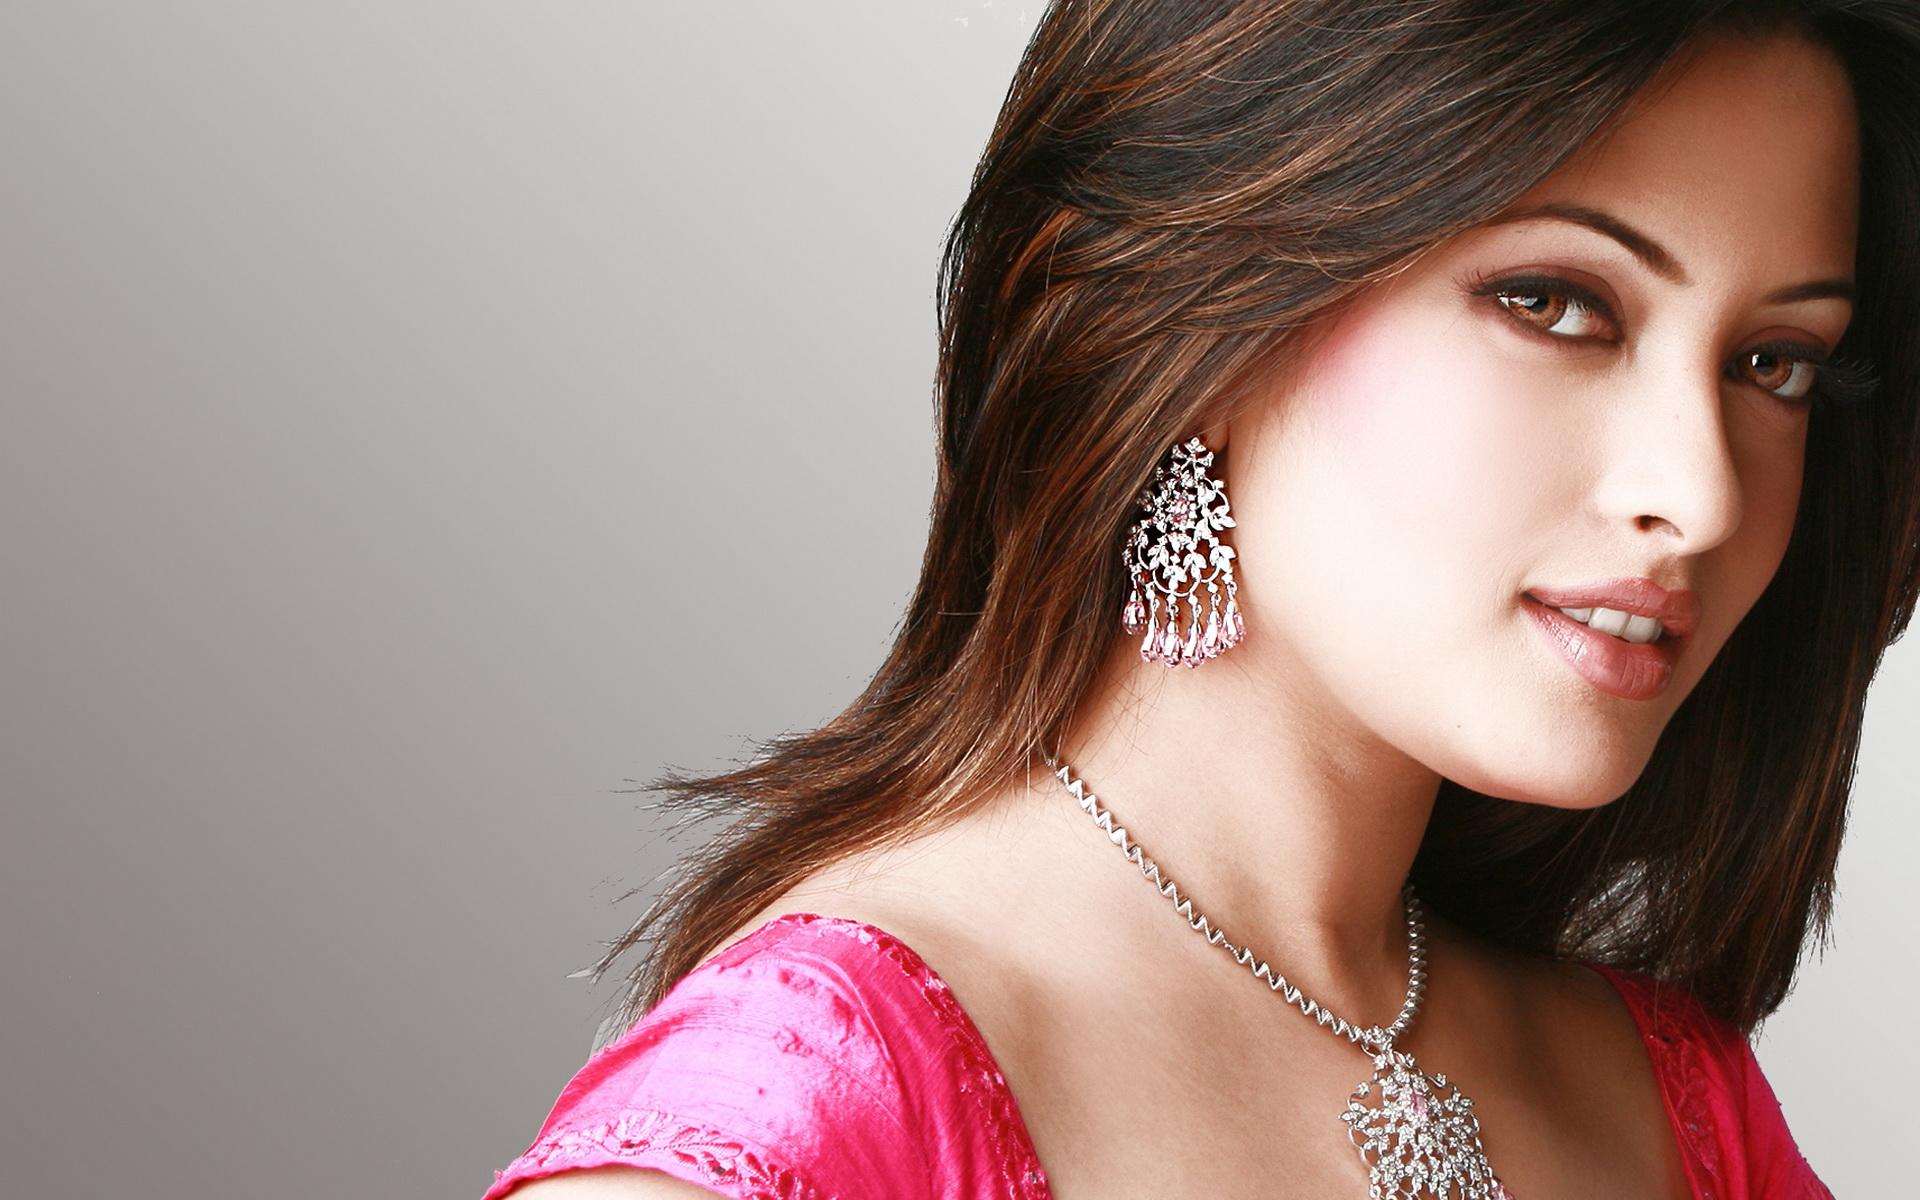 Beautiful Girl Wallpapers Qzn94 1024x640 Download Hd Wallpaper Wallpapertip